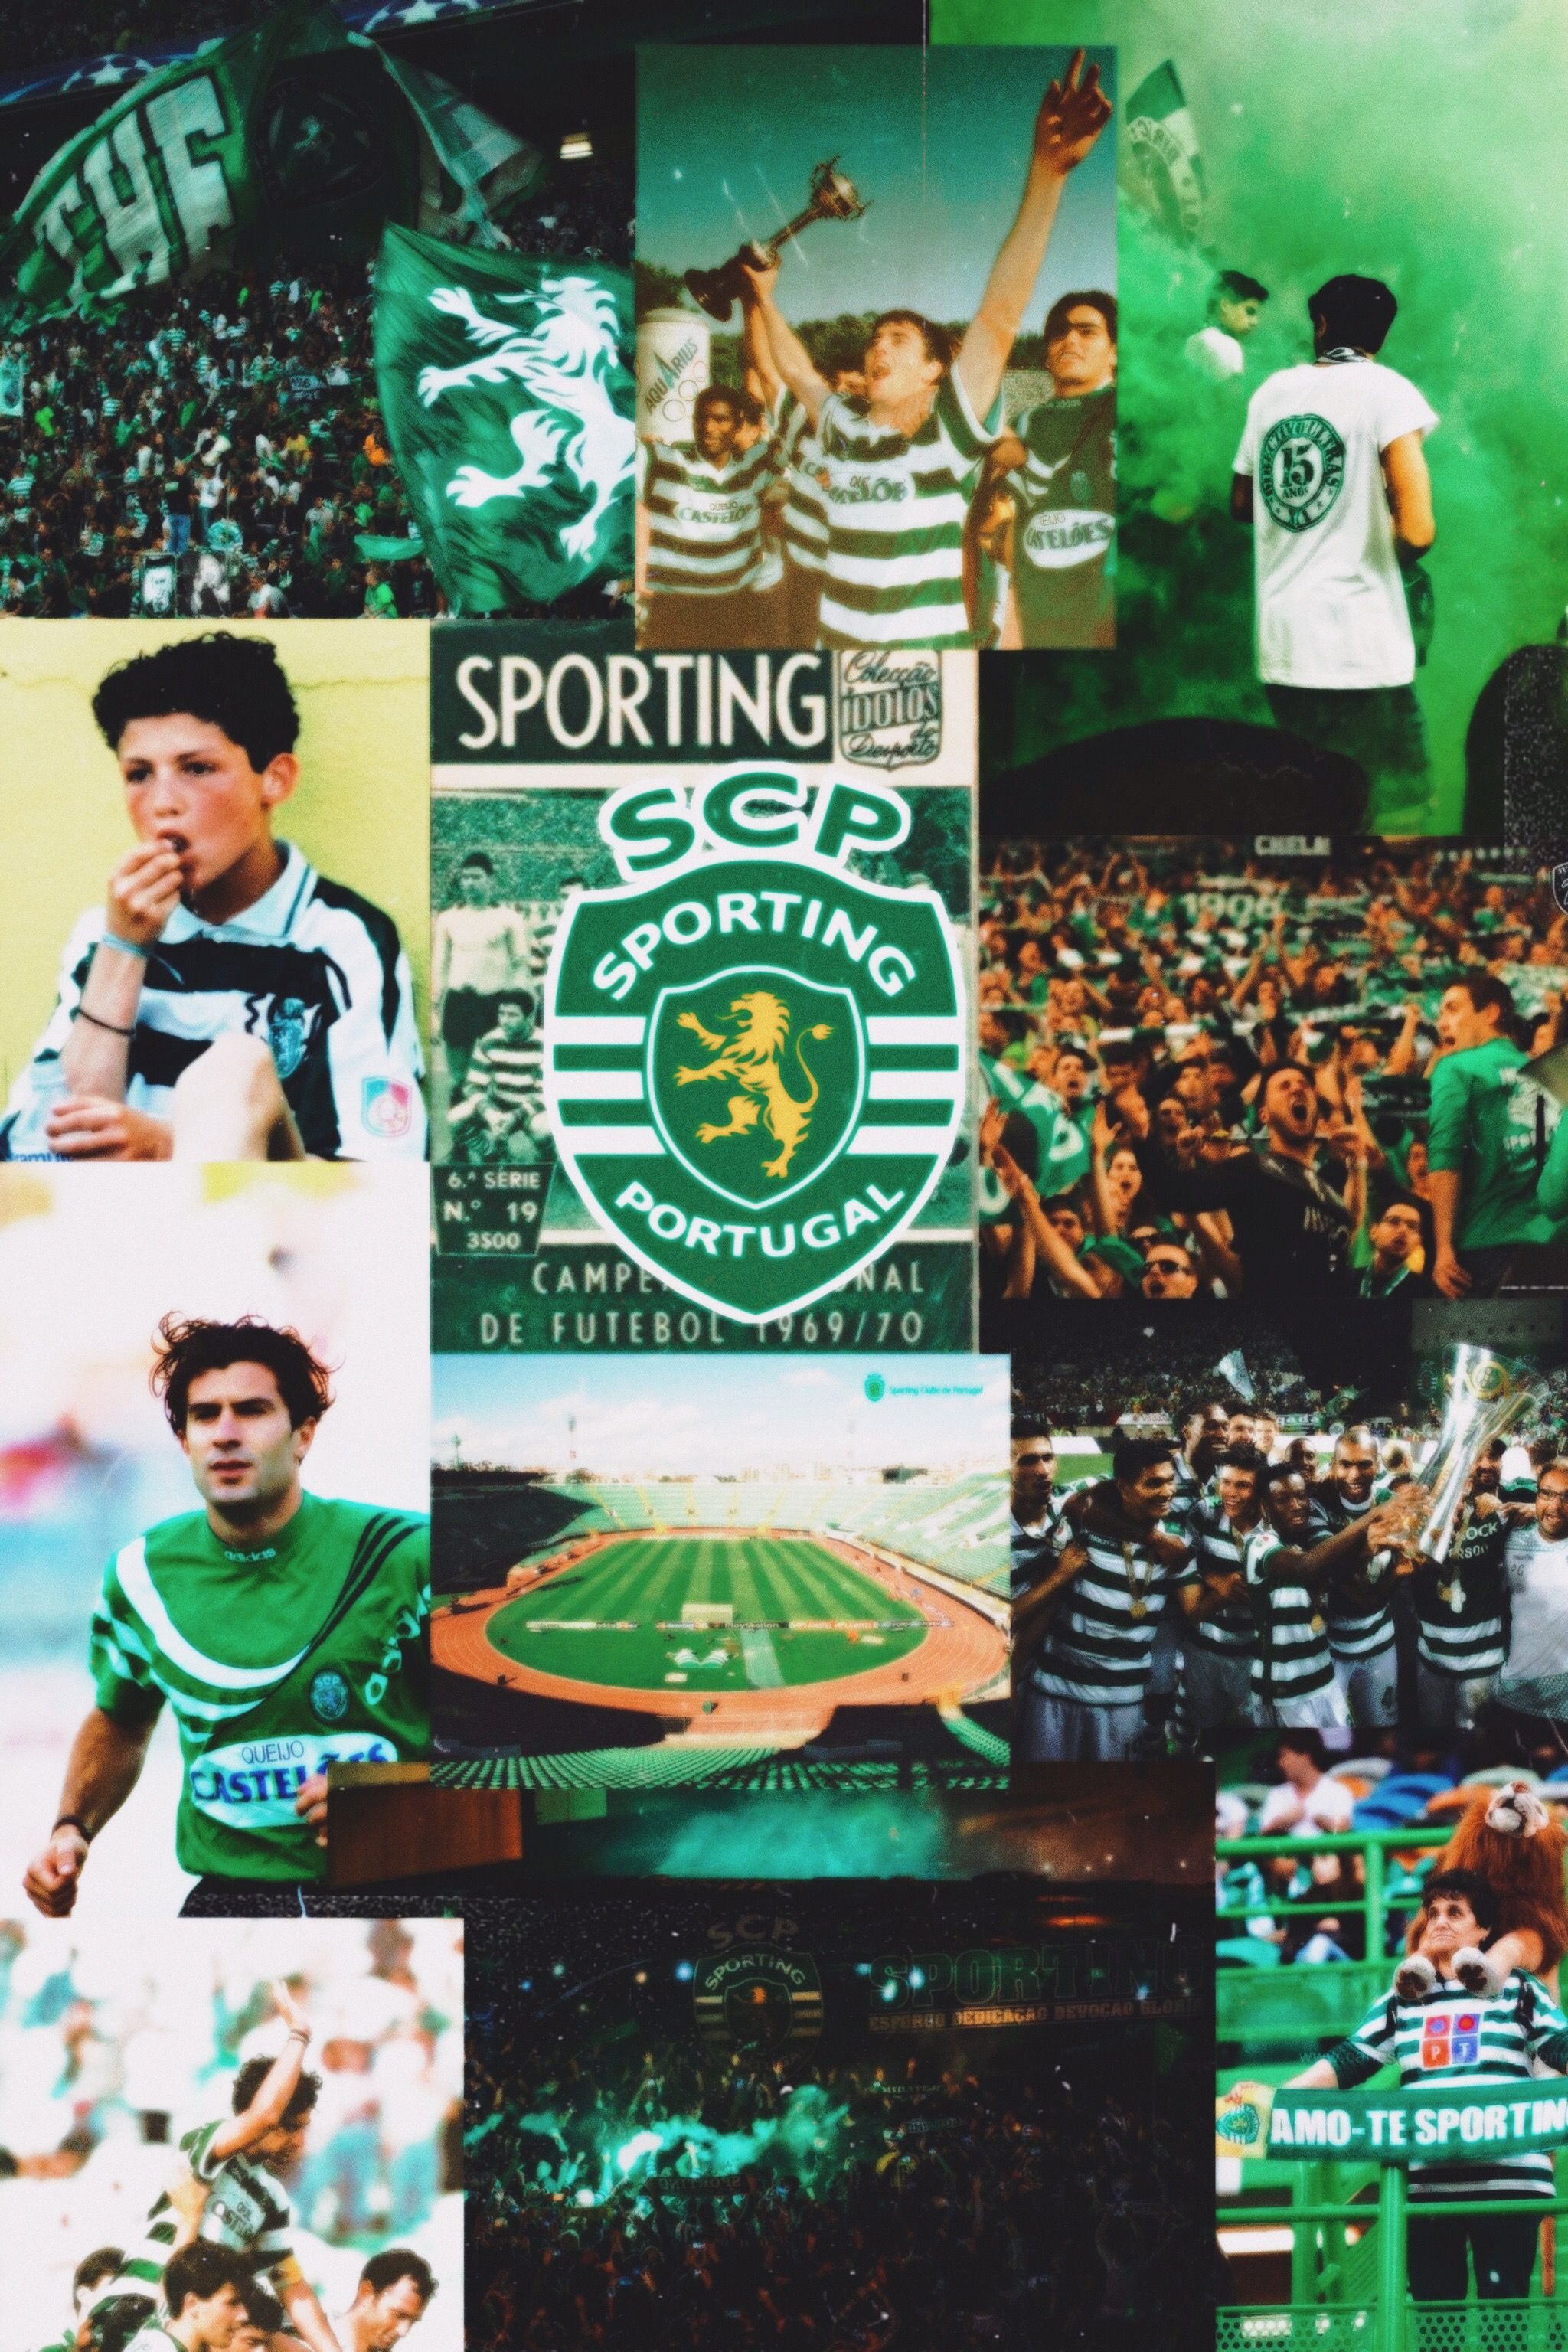 Sporting Sporting Clube De Portugal Sporting Clube Sporting